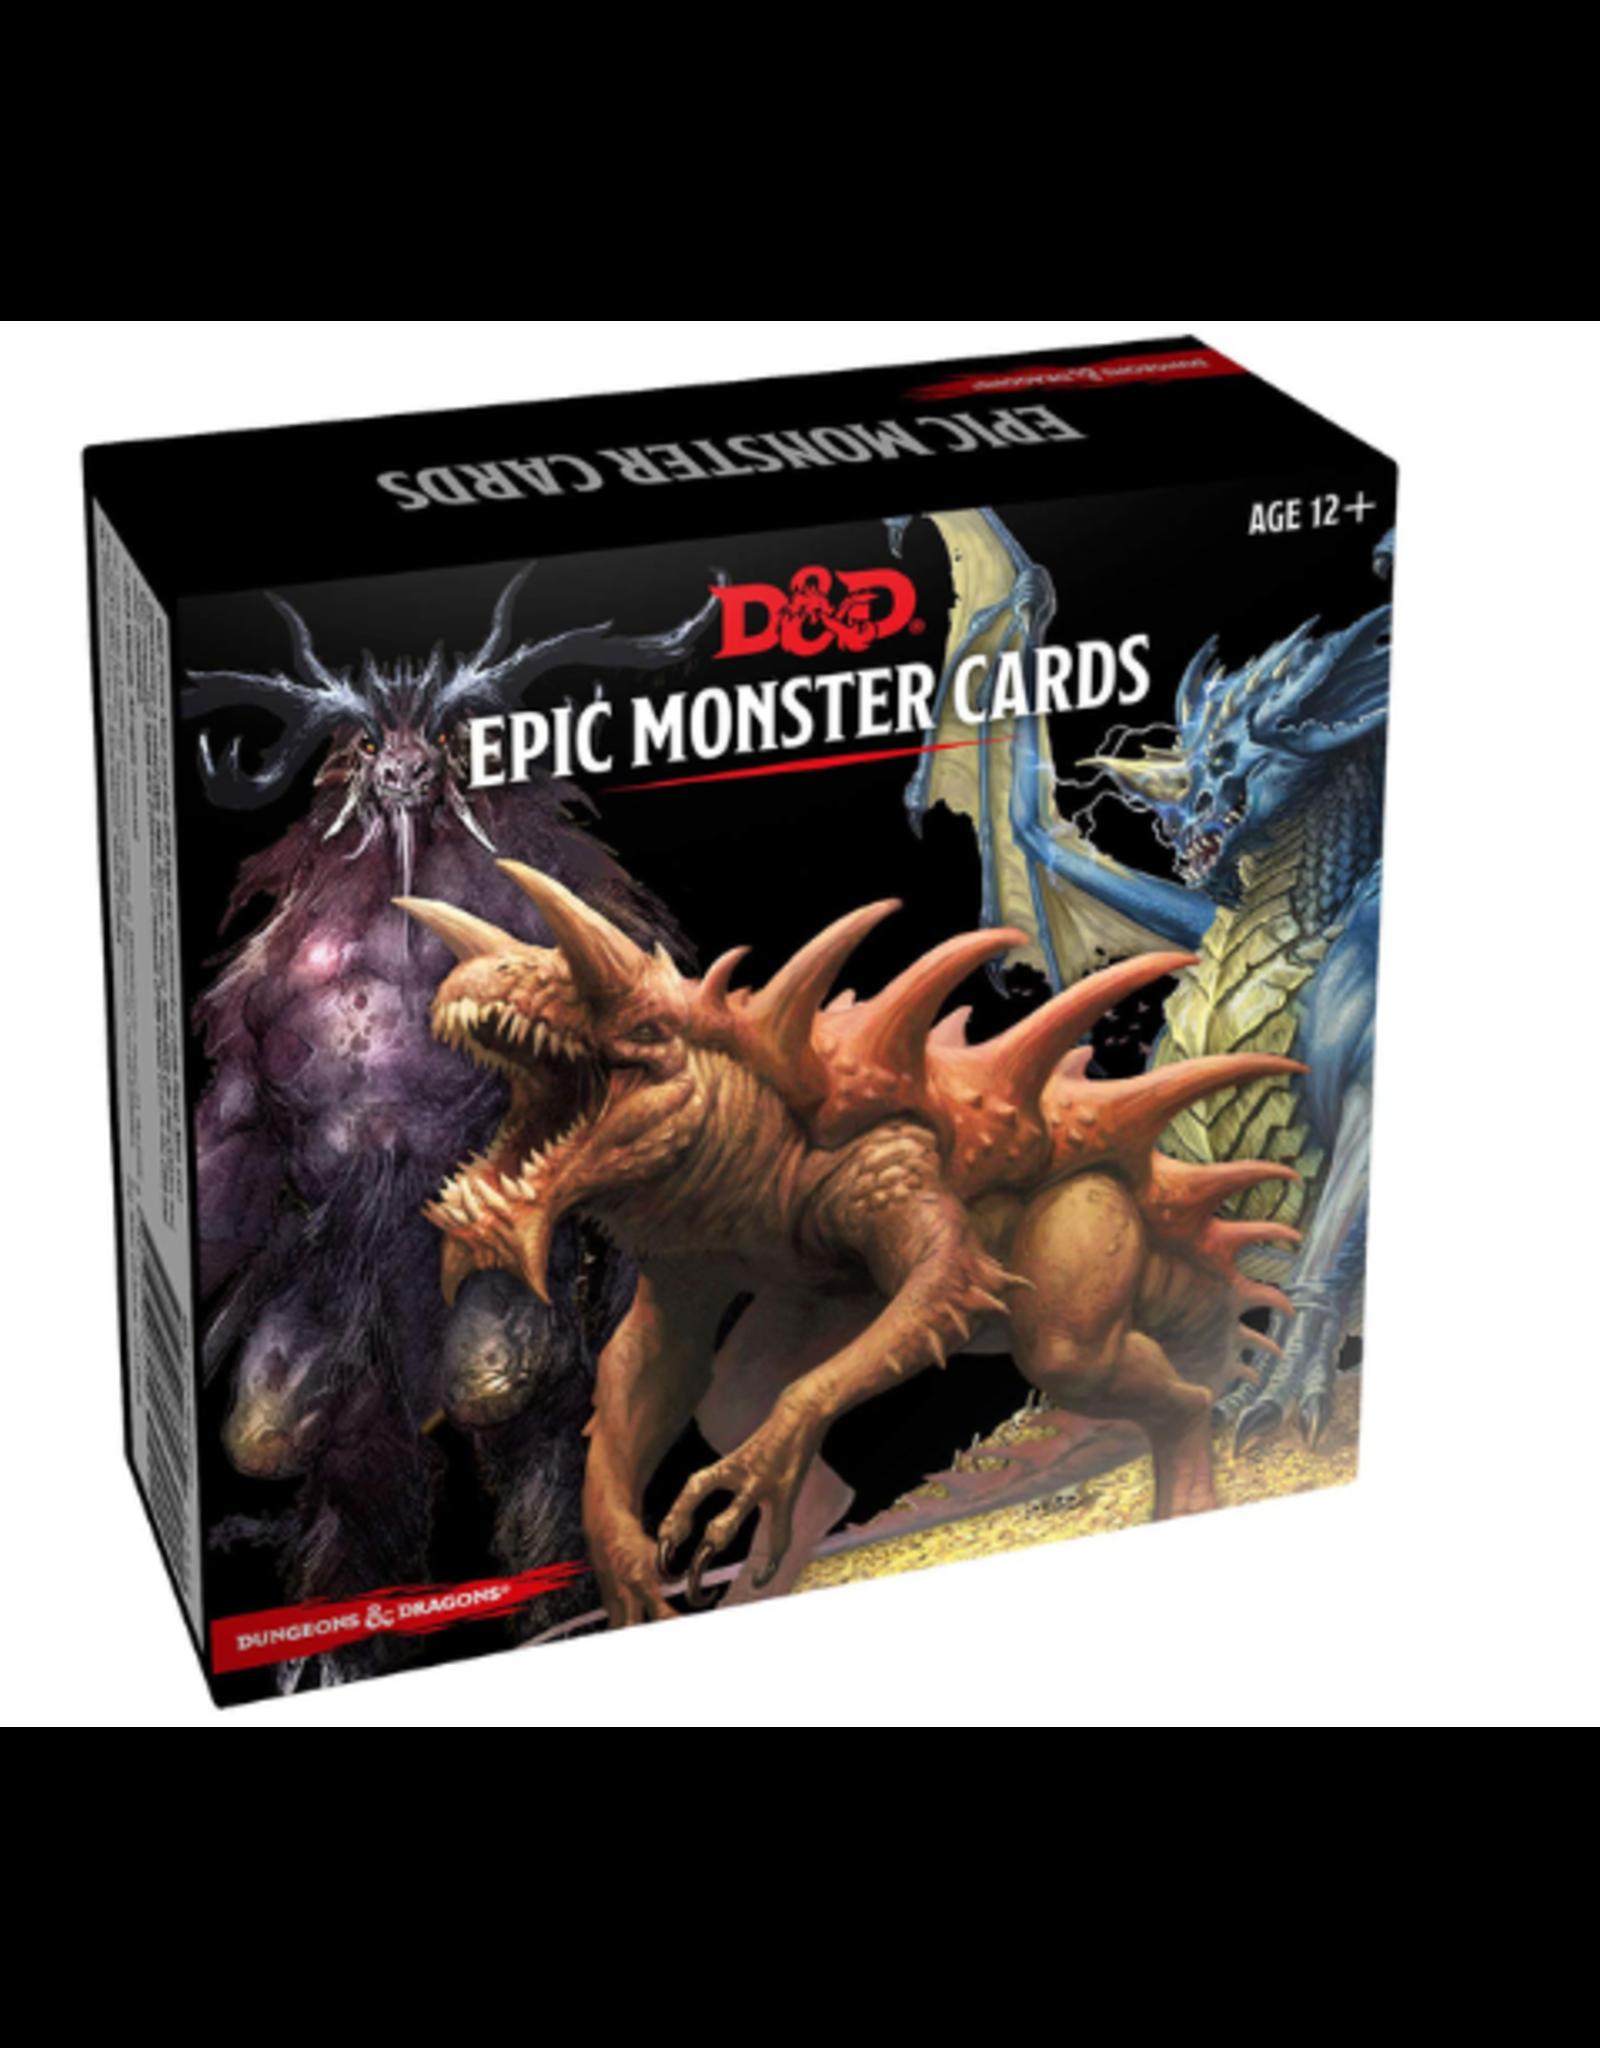 GaleForce Nine D&D 5th Edition: Monster Cards - Epic Monster Cards